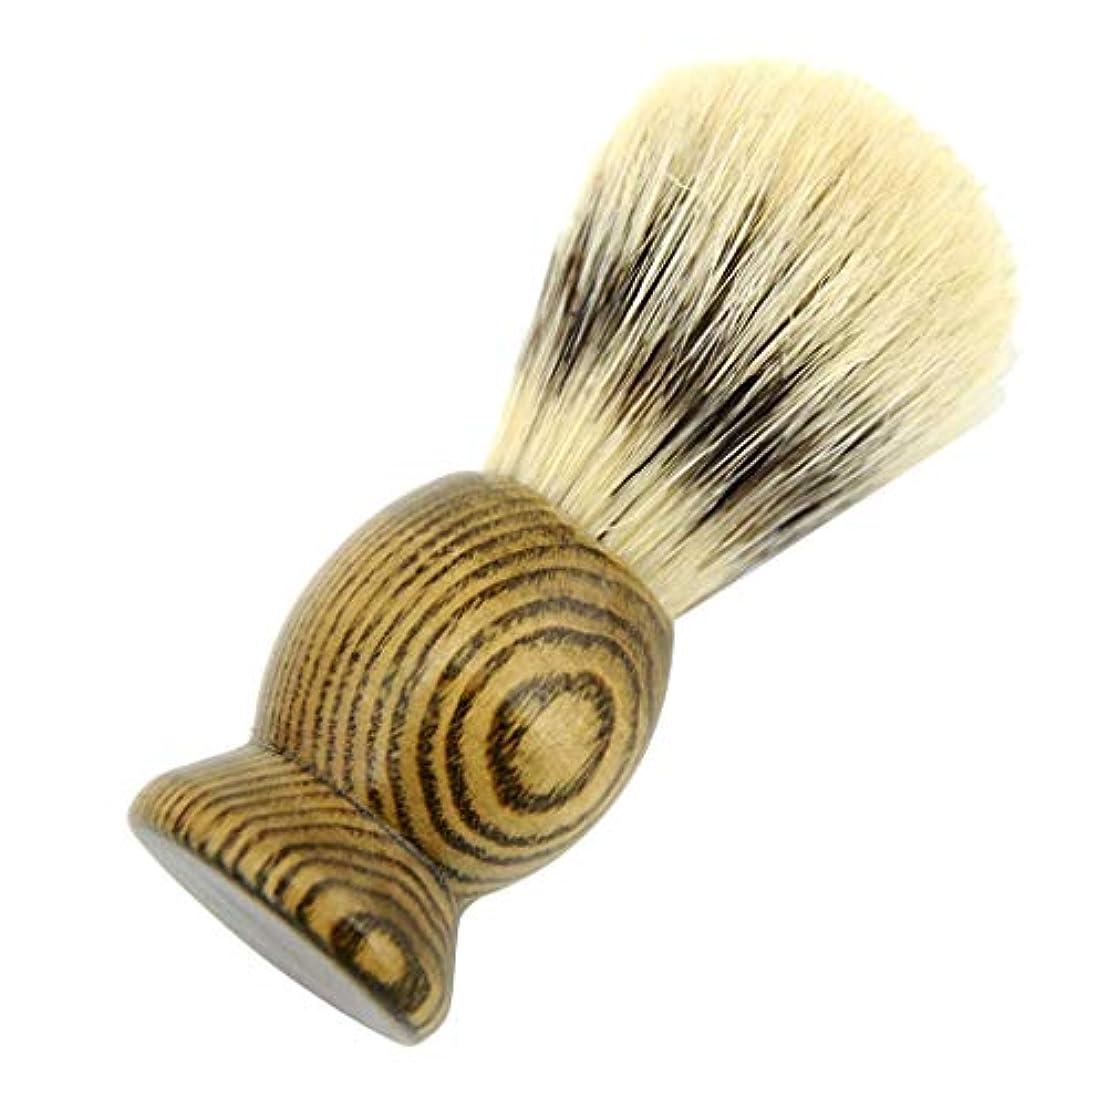 dailymall メンズ シェービング用ブラシ 理容 洗顔 髭剃り 泡立ち サロン 家庭用 ボックス付 快適